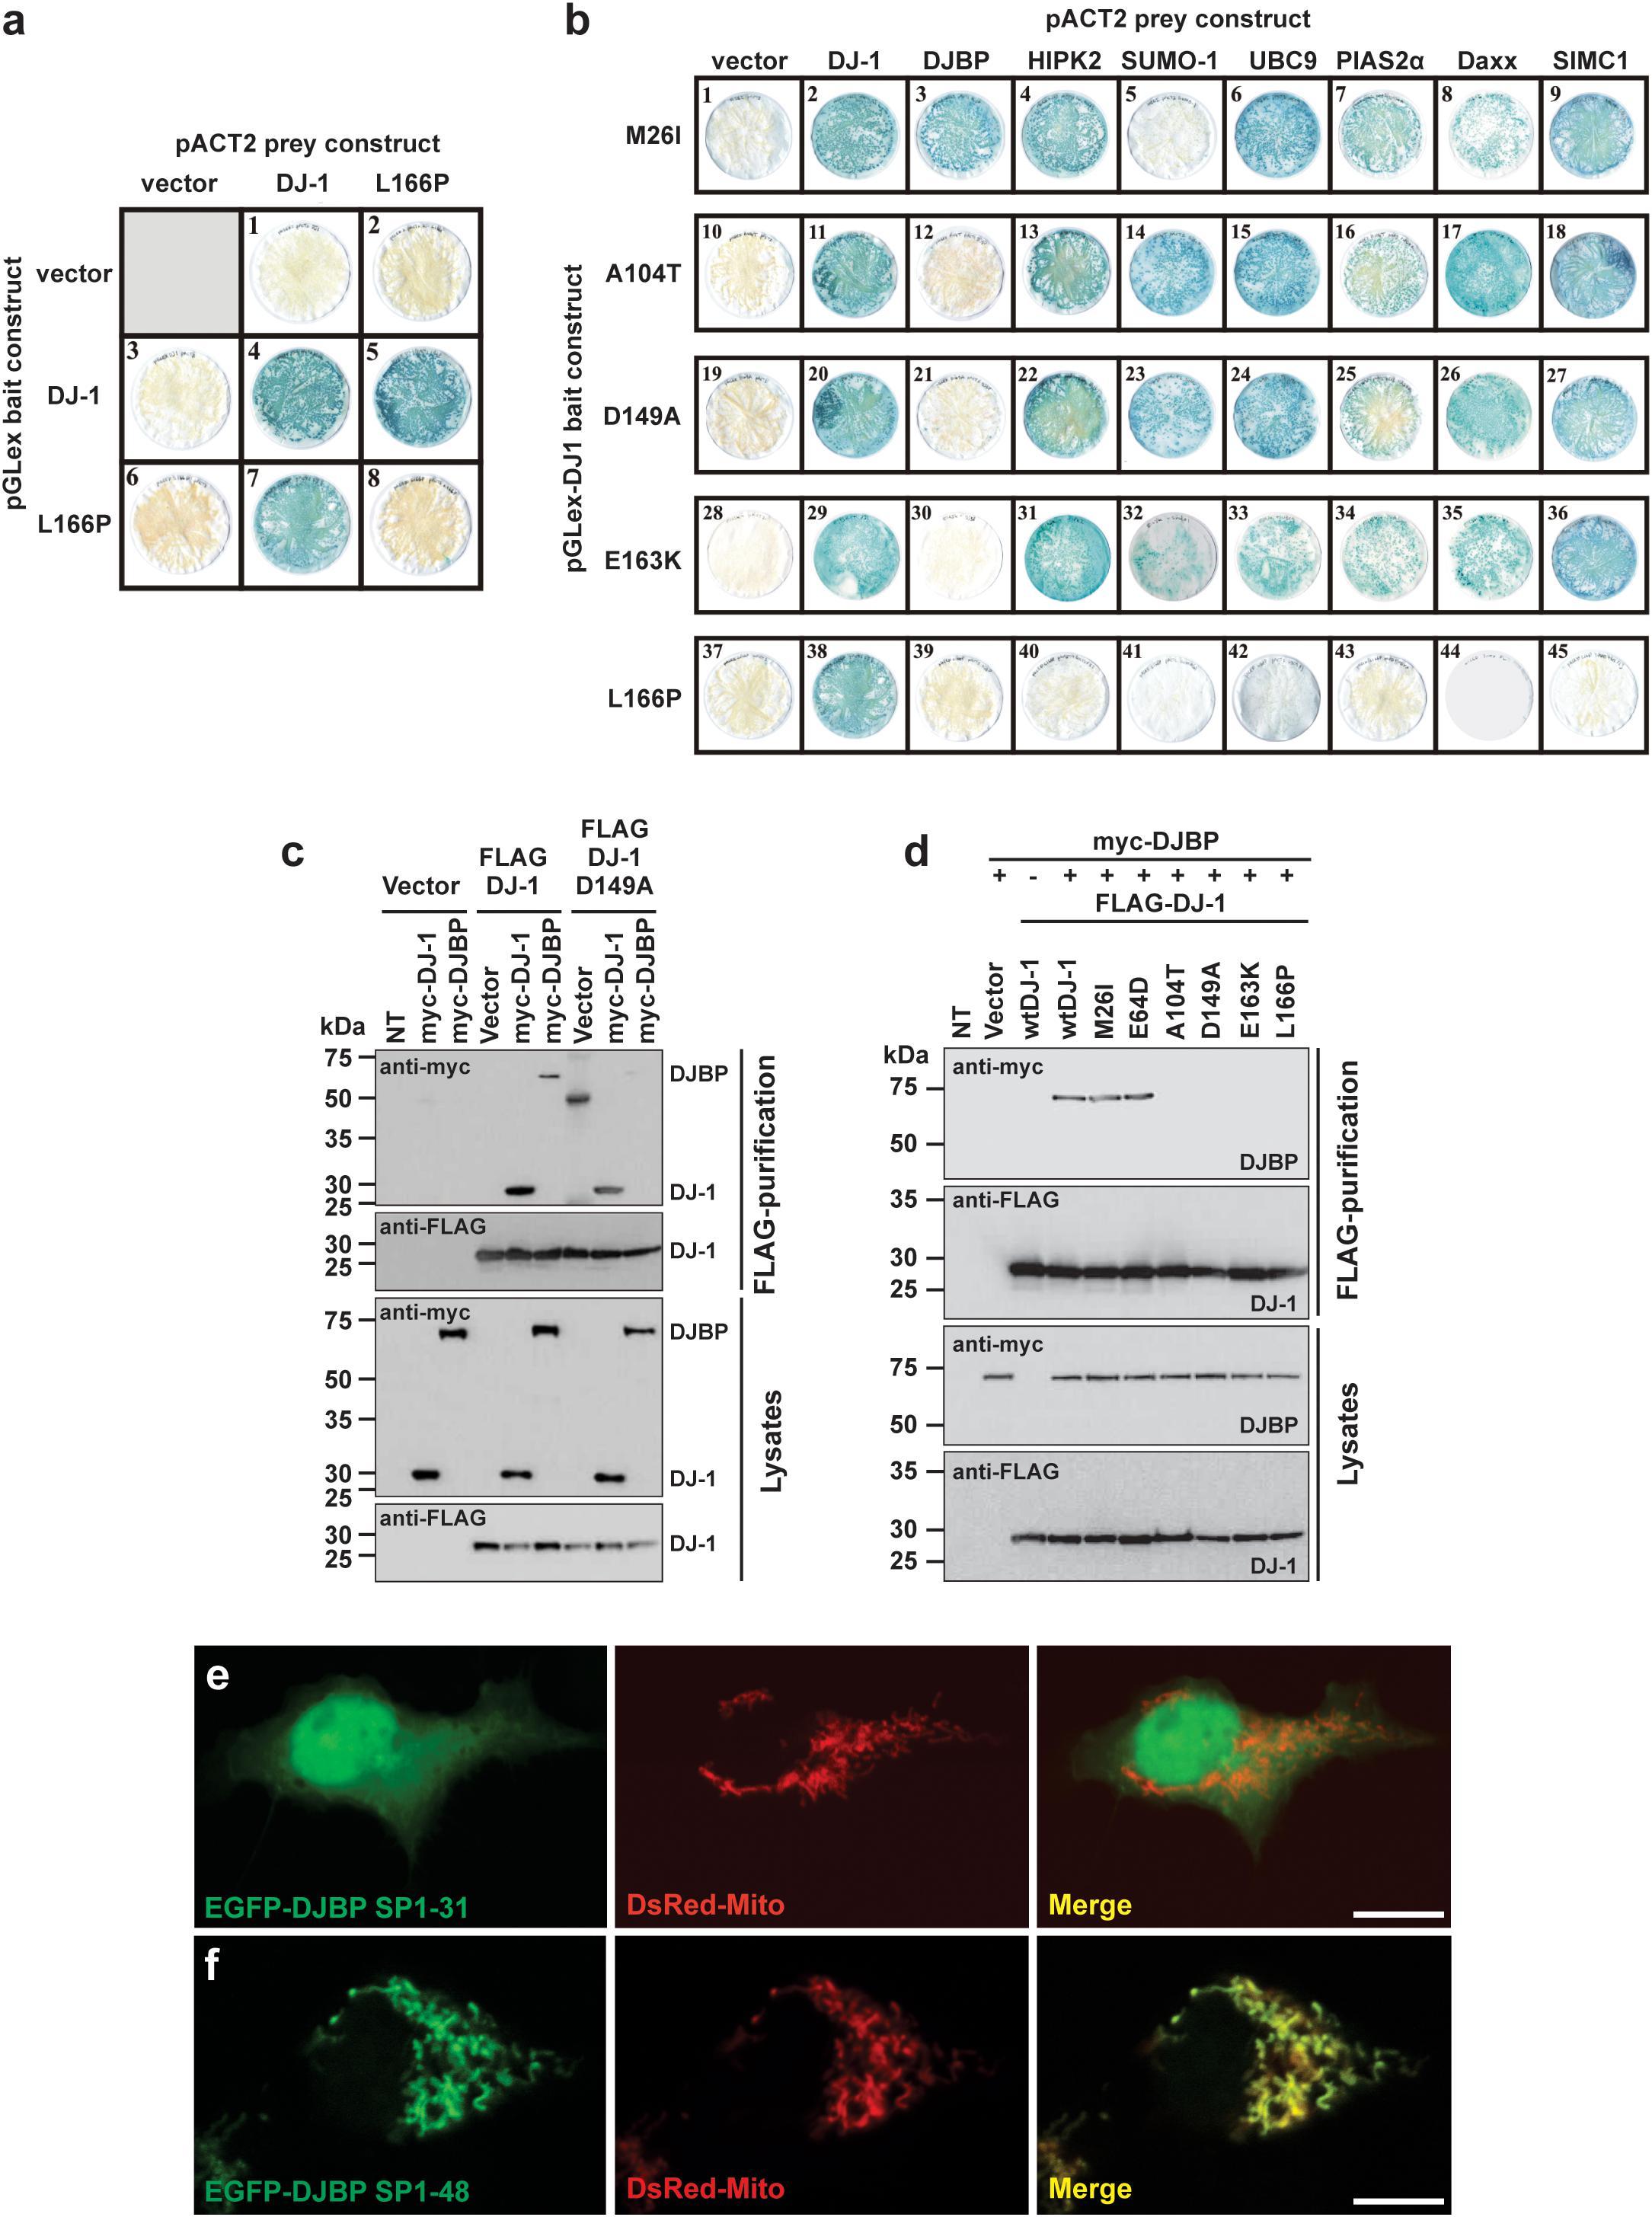 Frontiers | Distinct Mechanisms of Pathogenic DJ-1 Mutations